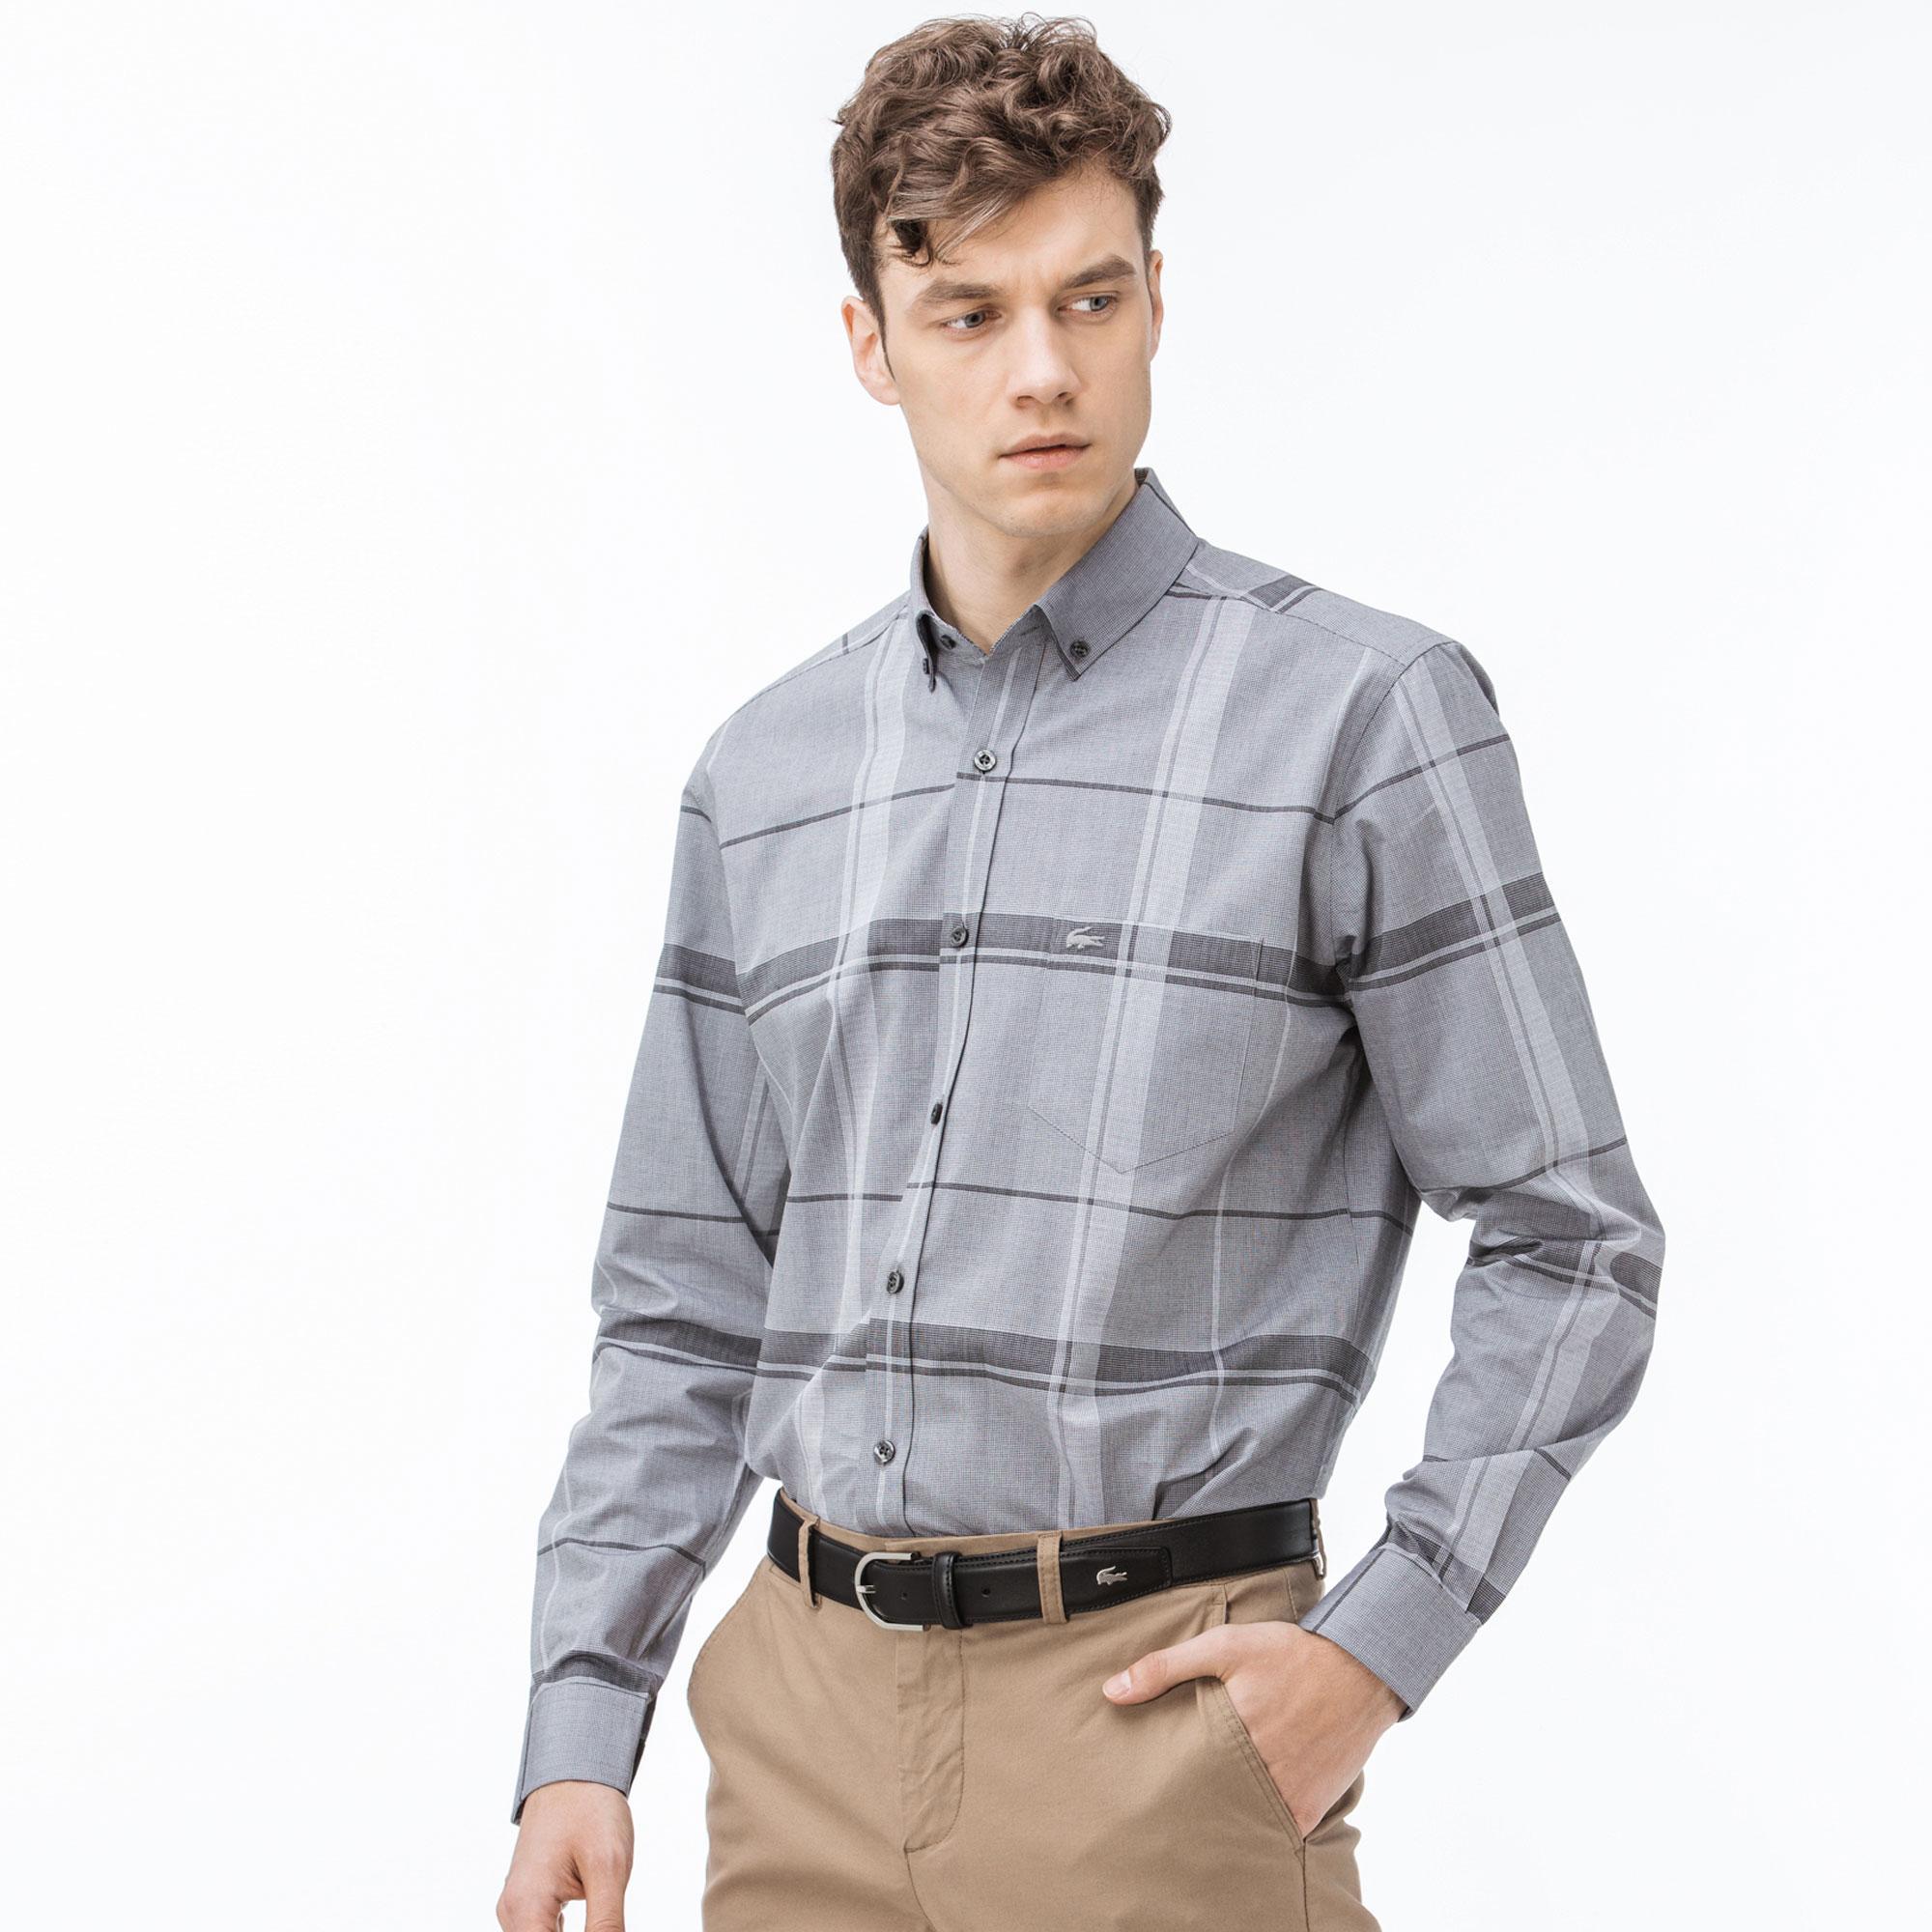 Lacoste Erkek Regular Fit Ekose Siyah-Gri Gömlek